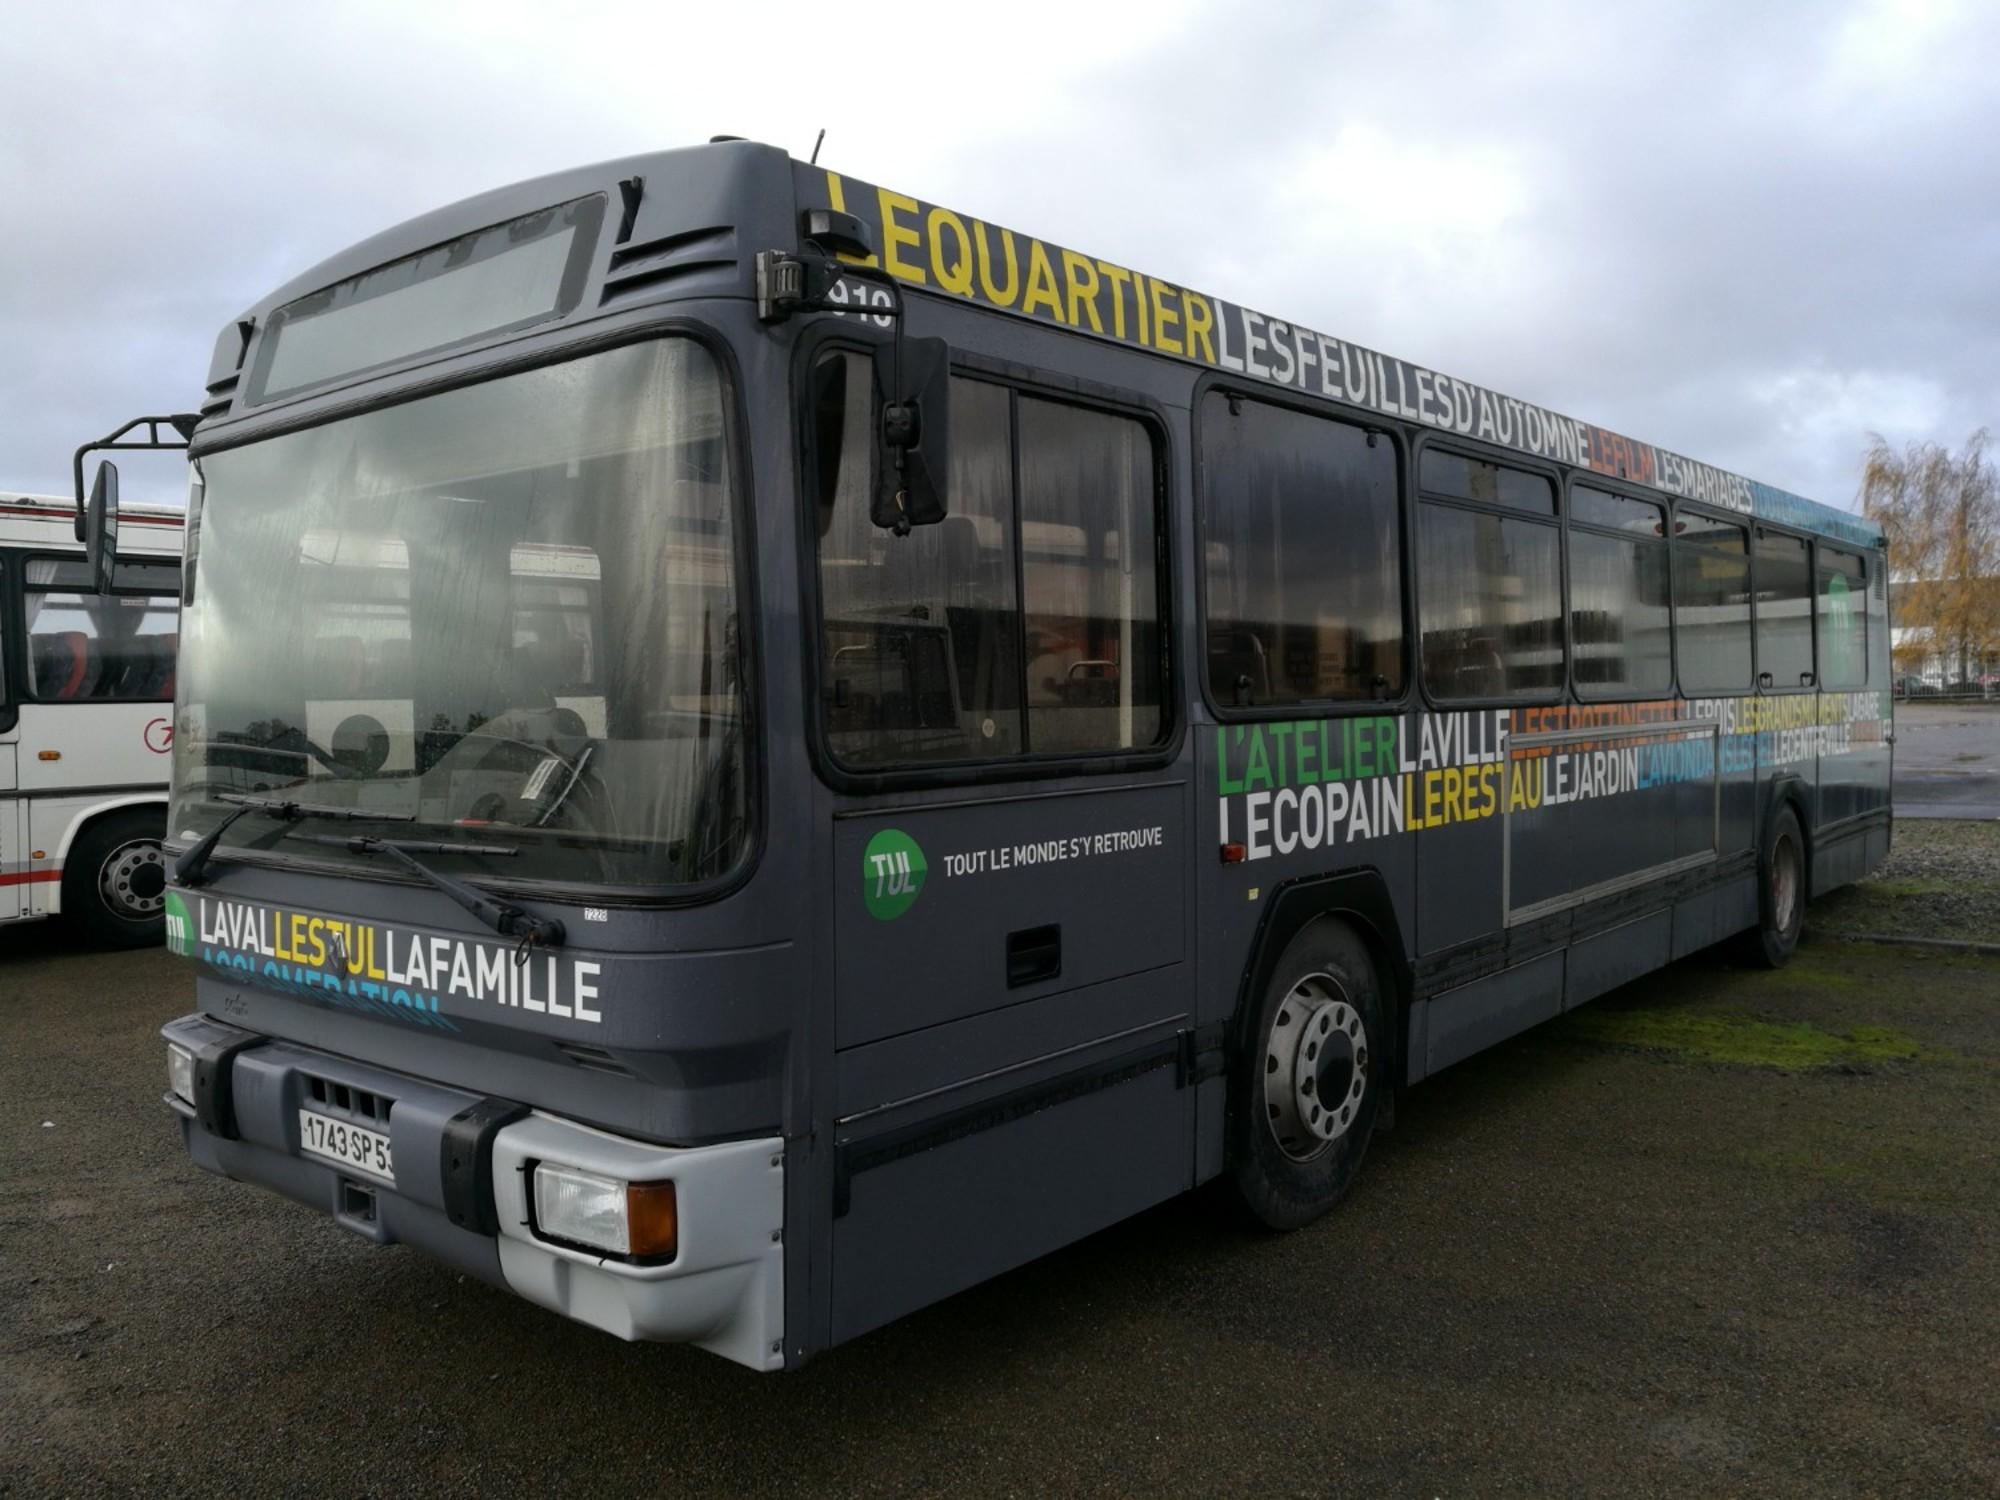 renault pr110 7228 car bus d 39 occasion aux ench res. Black Bedroom Furniture Sets. Home Design Ideas